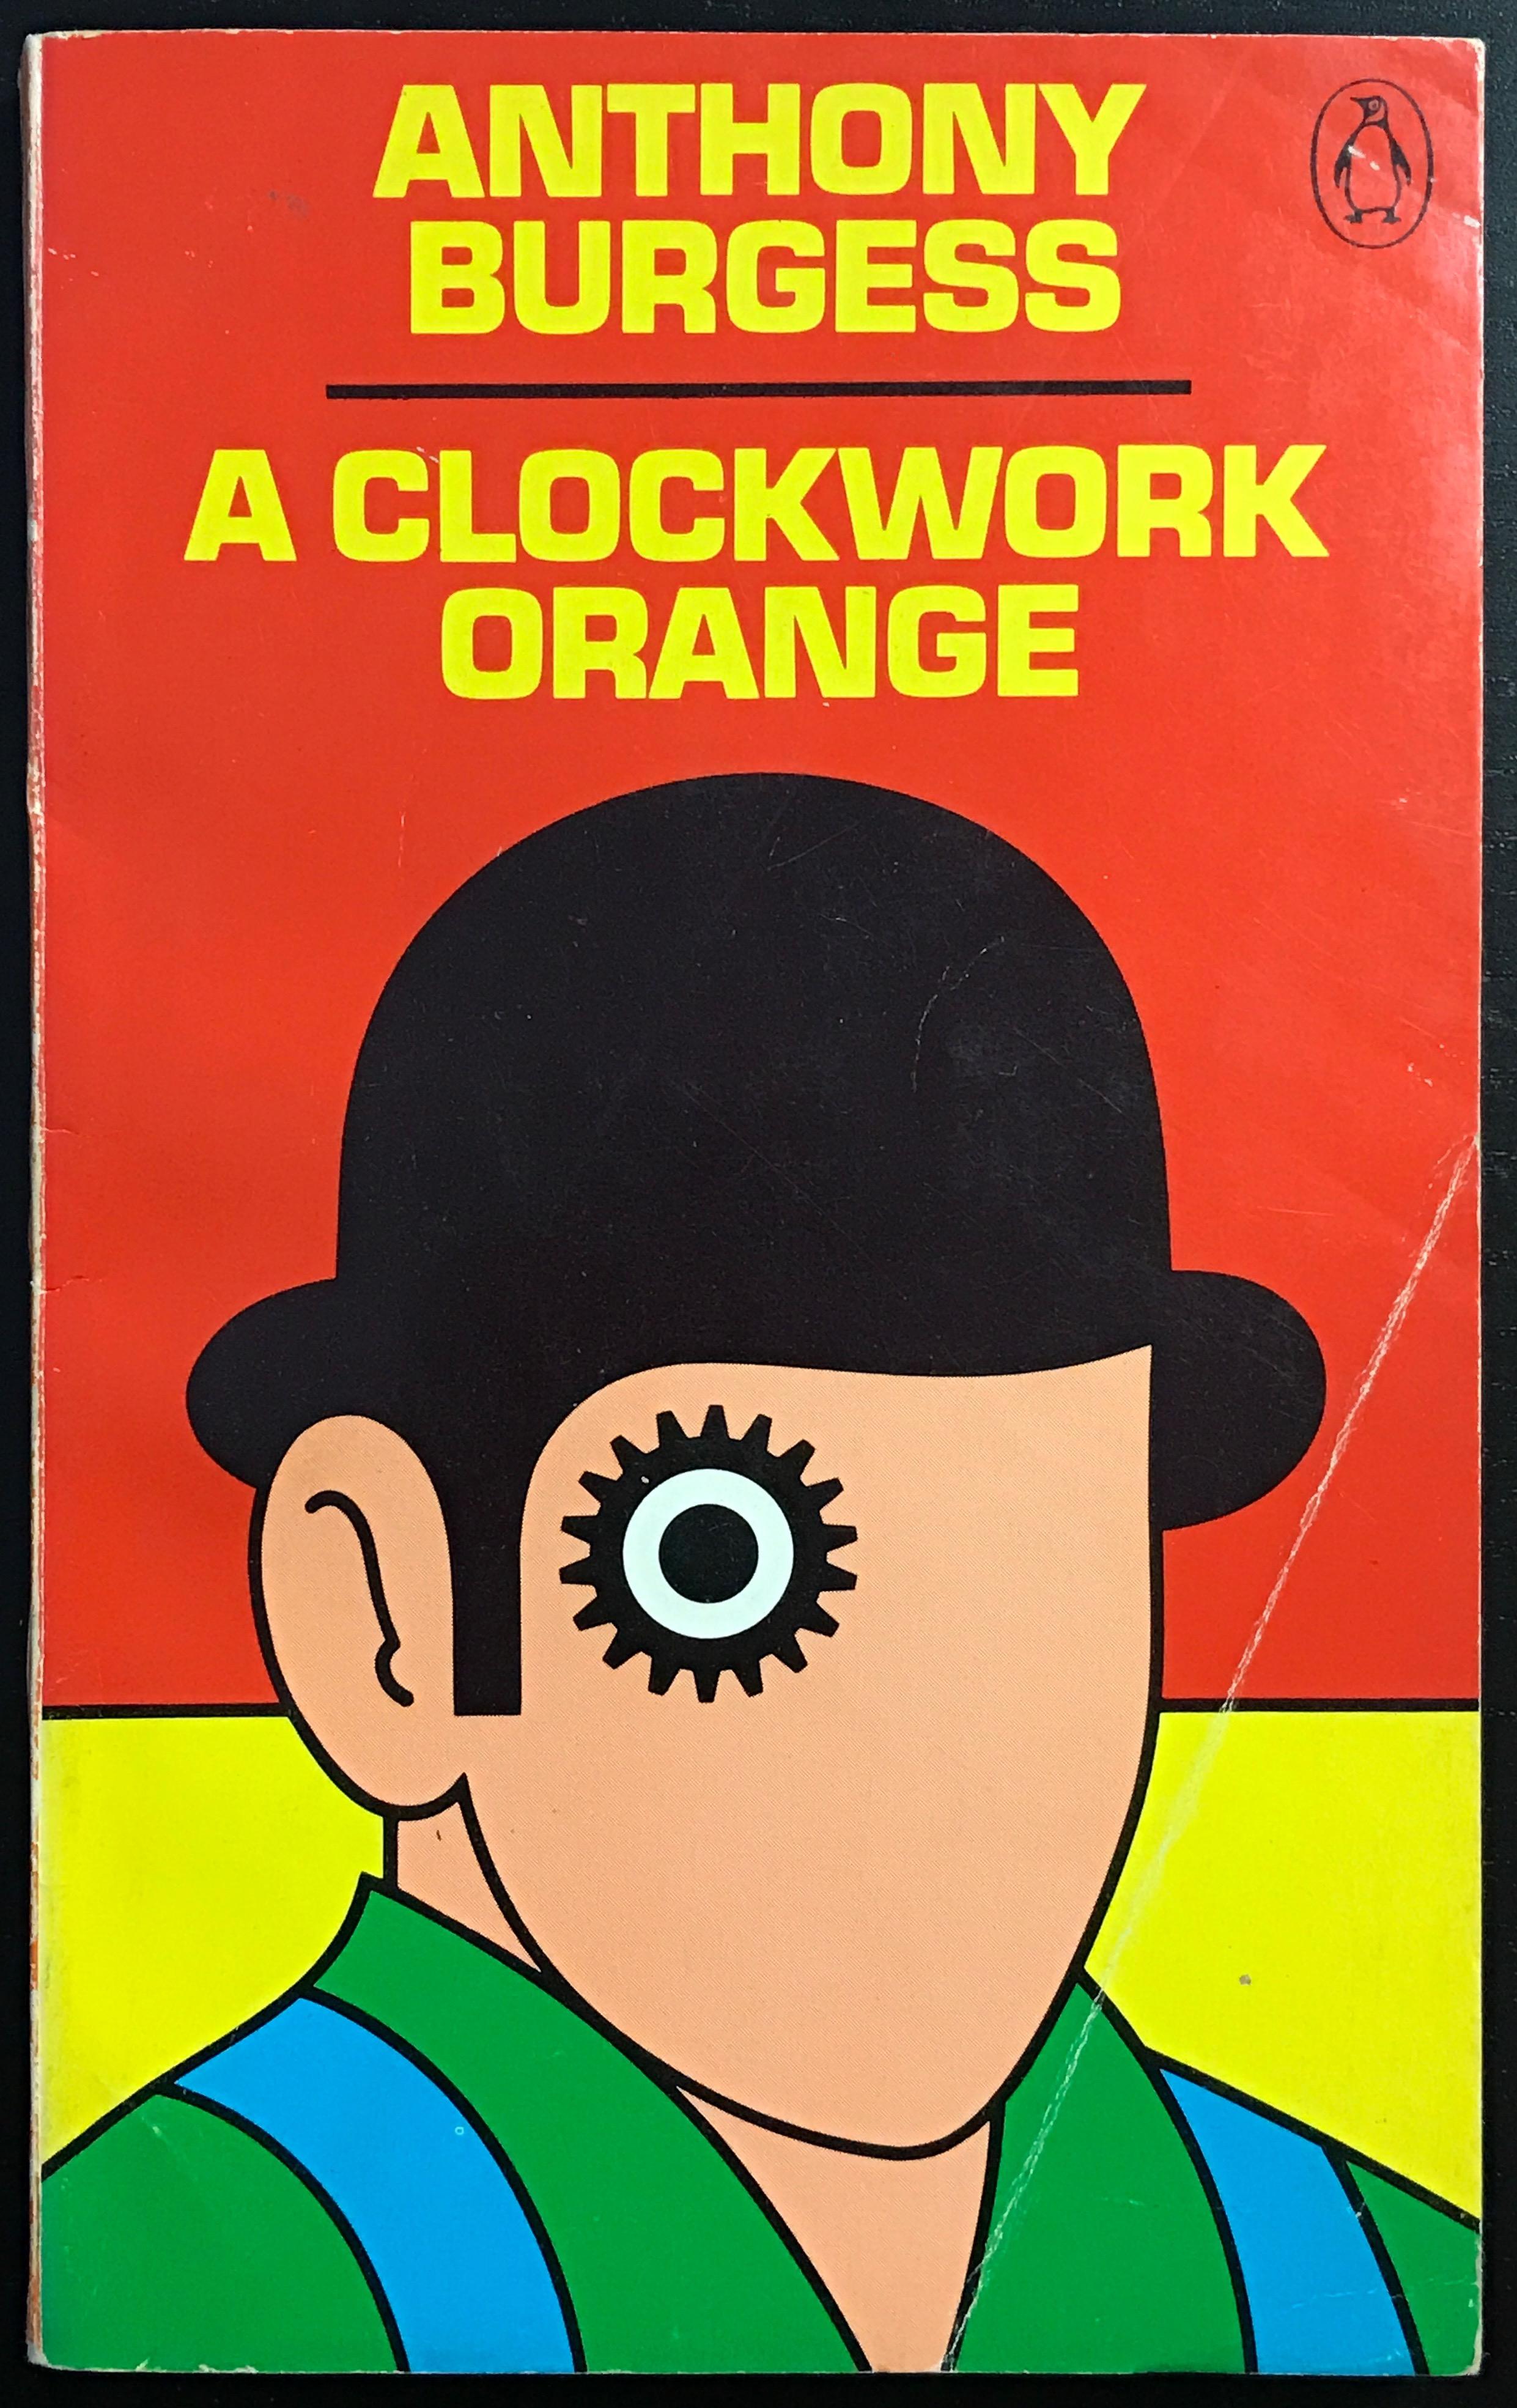 A Clockwork Orange – Anthony Burgess (Penguin SF) - Fonts In Use